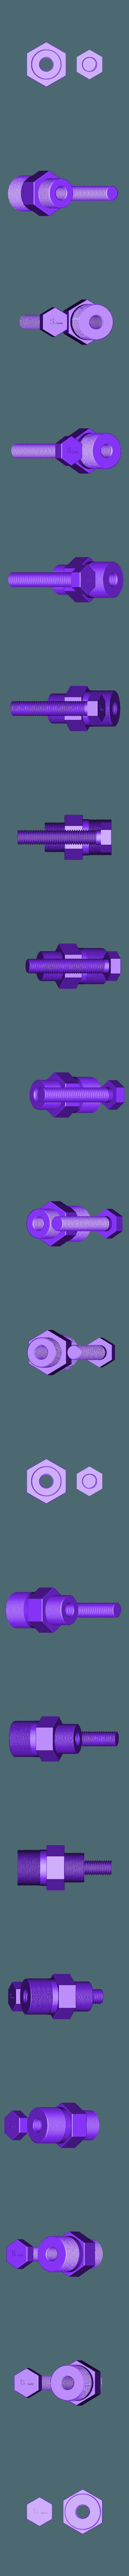 pièce 2 - vis.stl Download free STL file Flying rake • 3D printable design, Simonchantcliquet